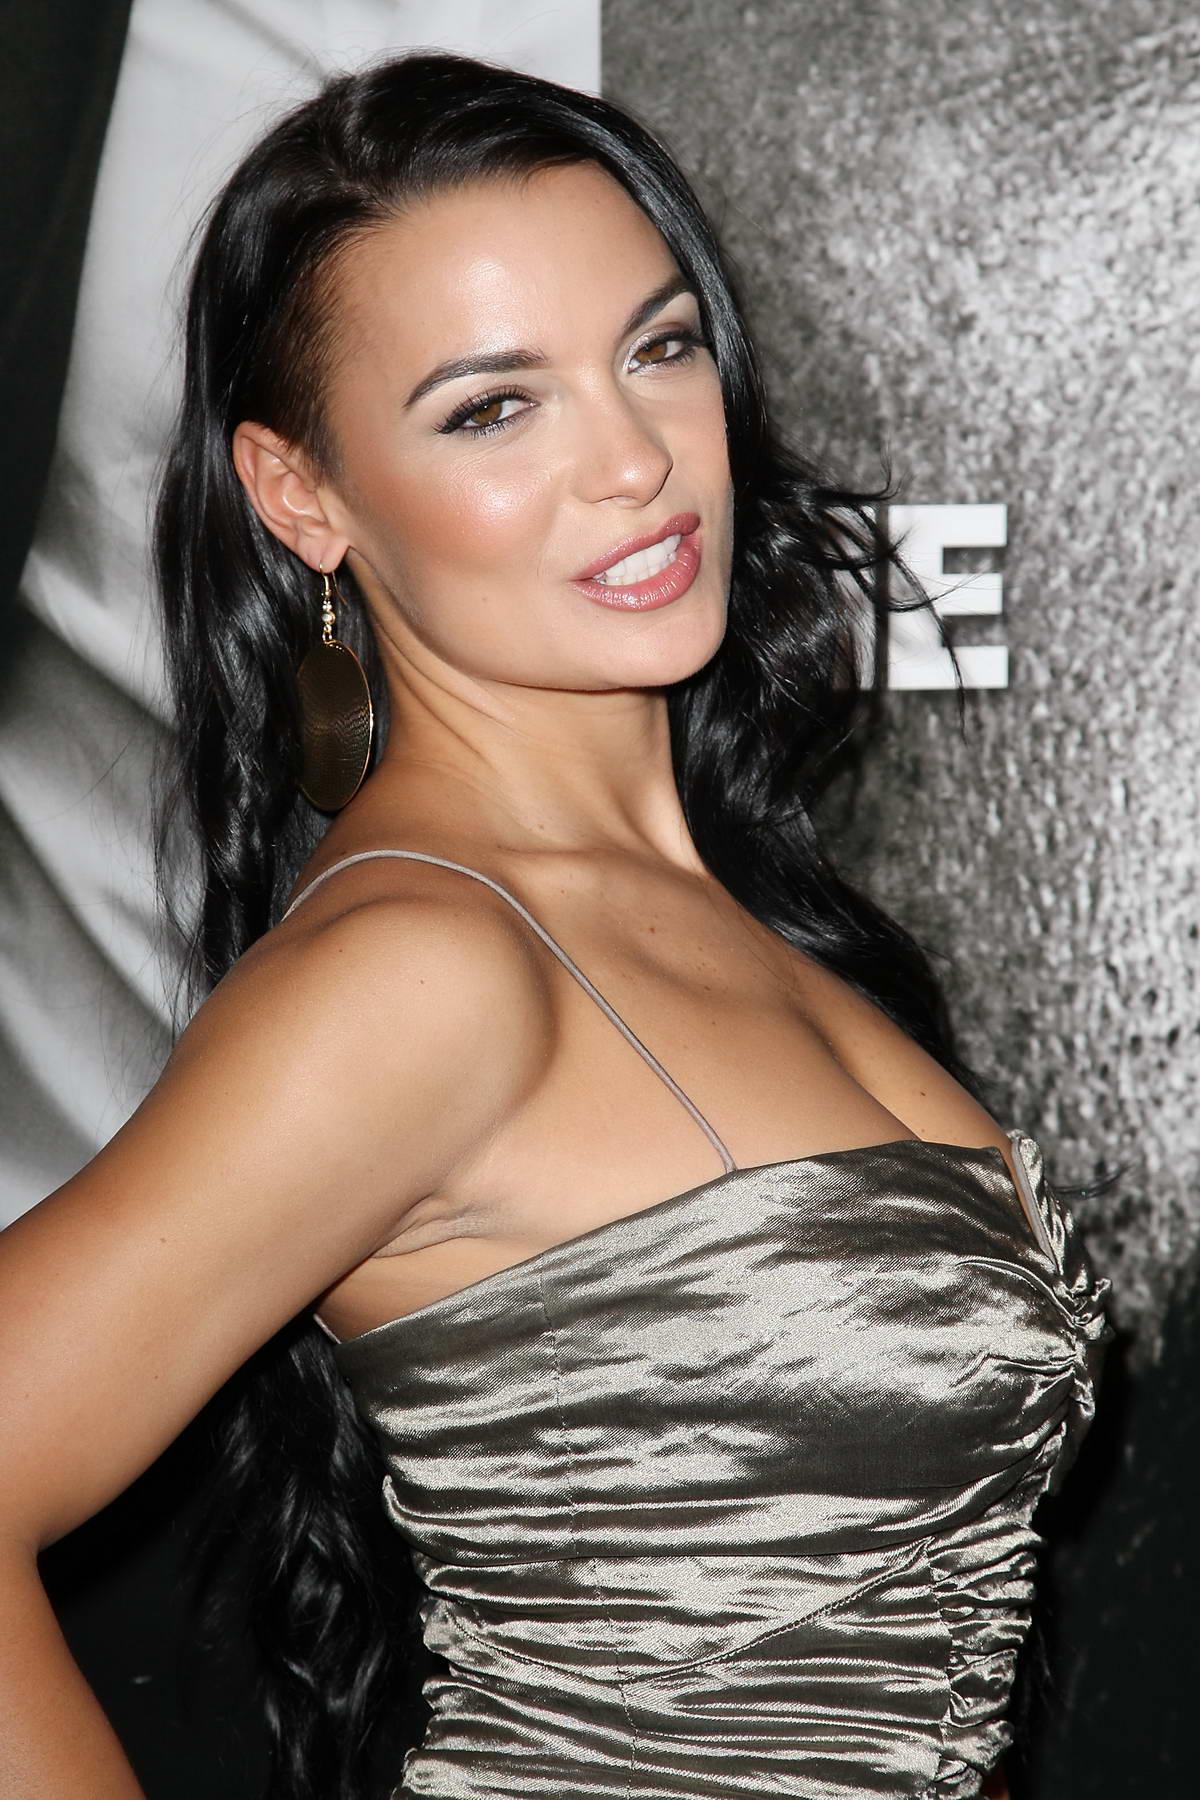 Rachel Nichols born January 8, 1980 (age 38),Kimberly Russell Porno pic Nicole Arumugam,Grace Parra